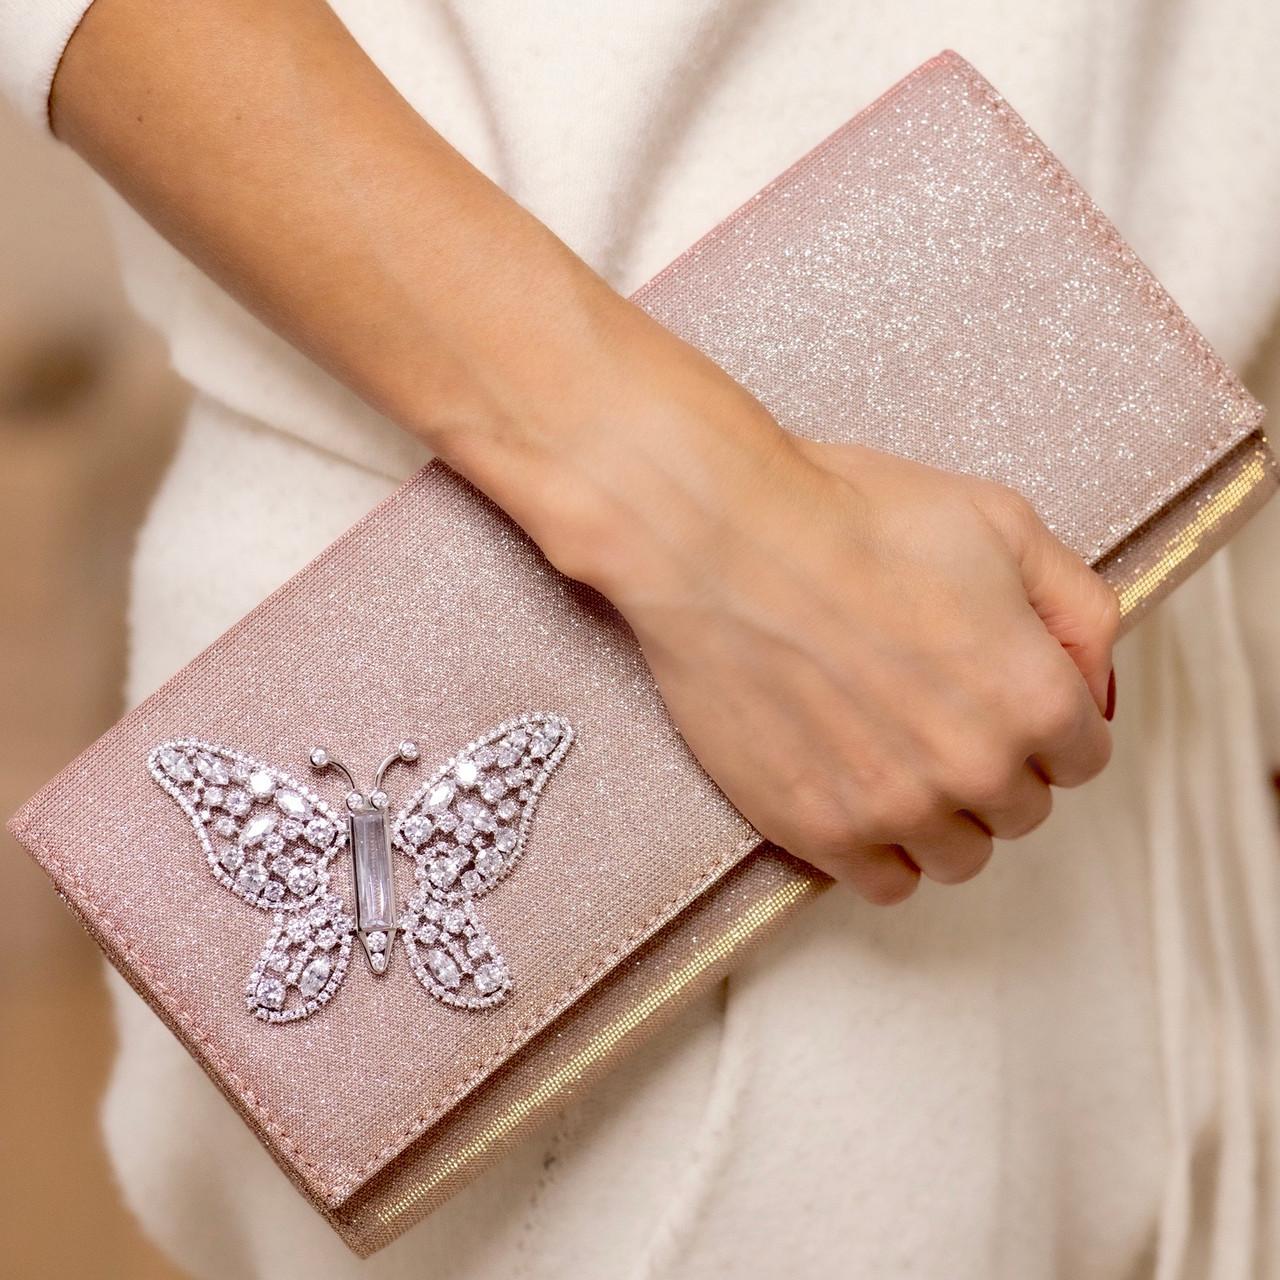 Farfalla Pink Notturno Clutch Bag